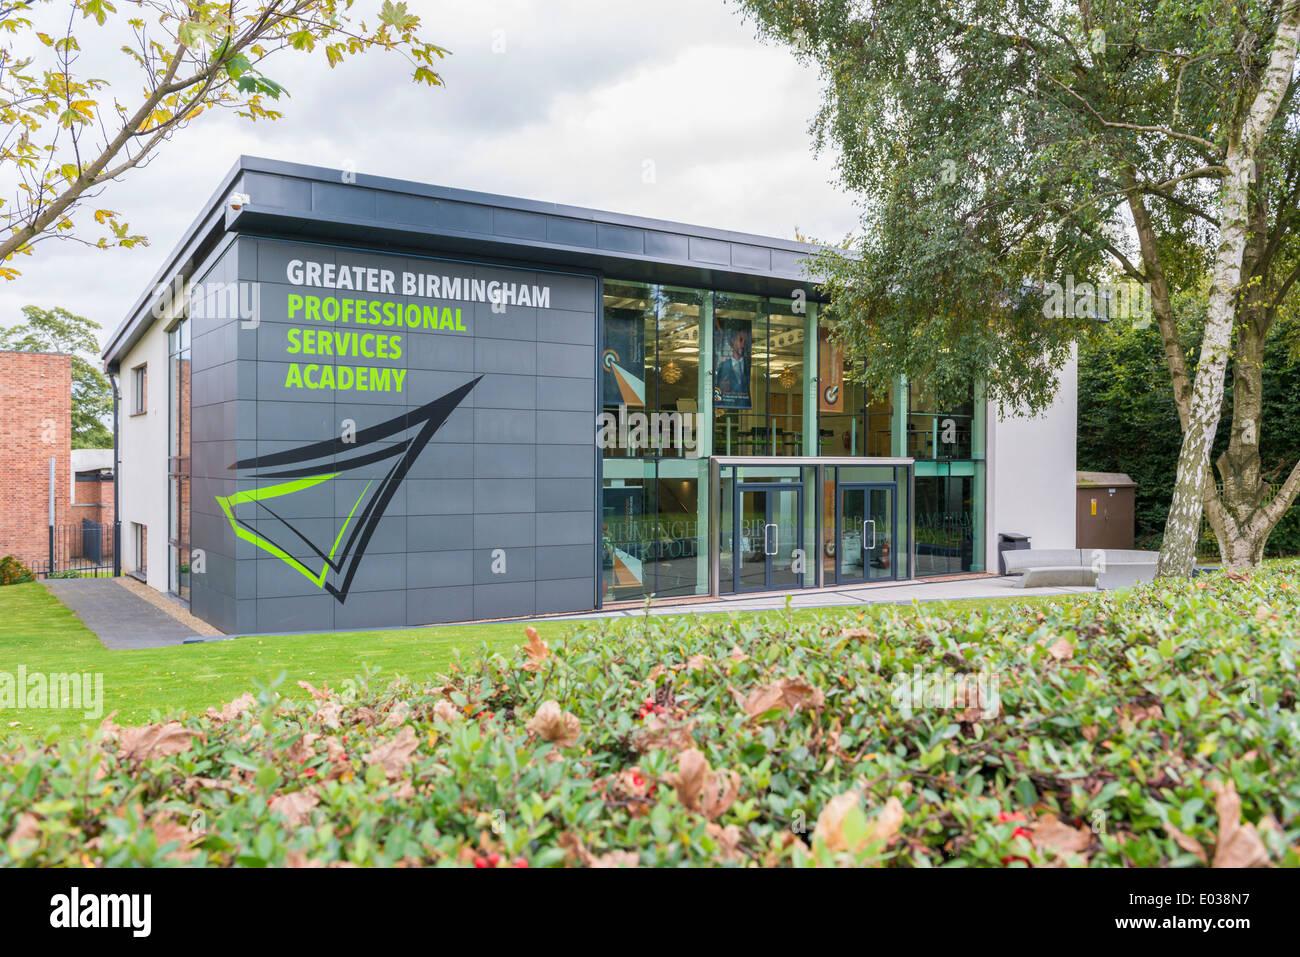 Größere Birmingham Professional Services Akademie, Sutton Coldfield, England, UK Stockbild